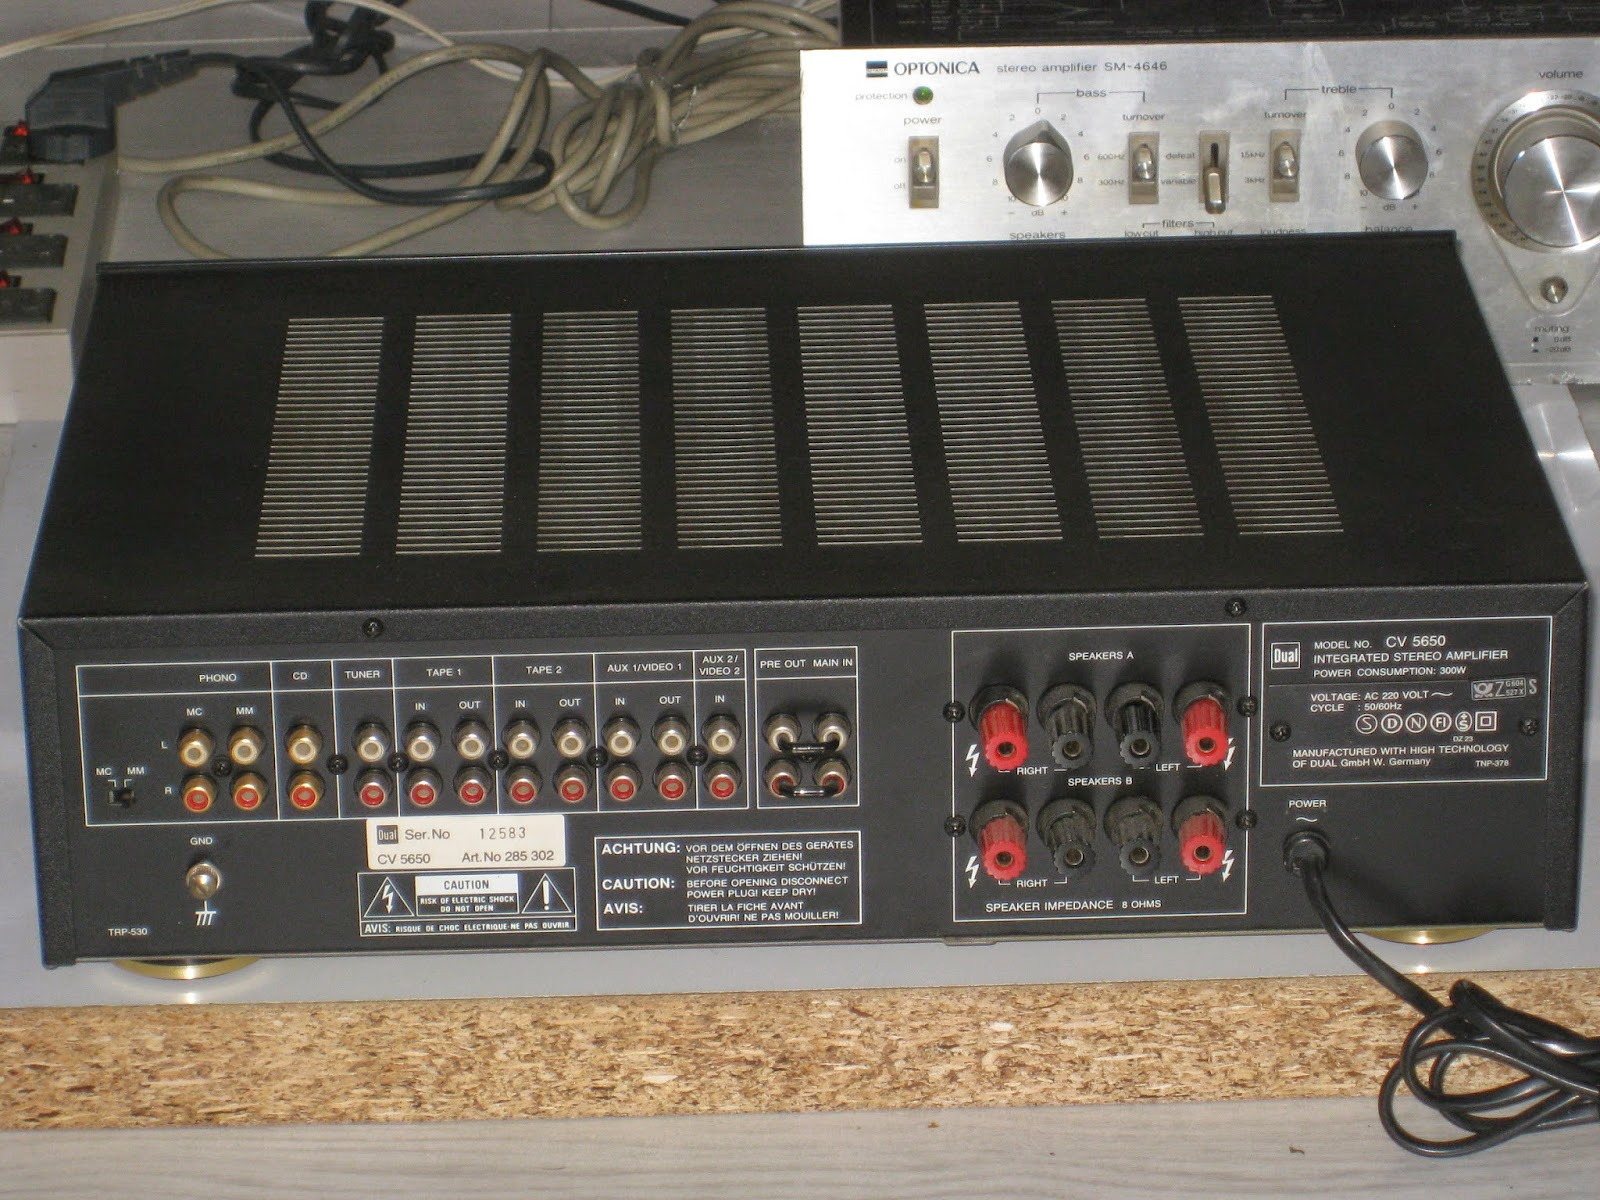 Concept Amplifier Manual